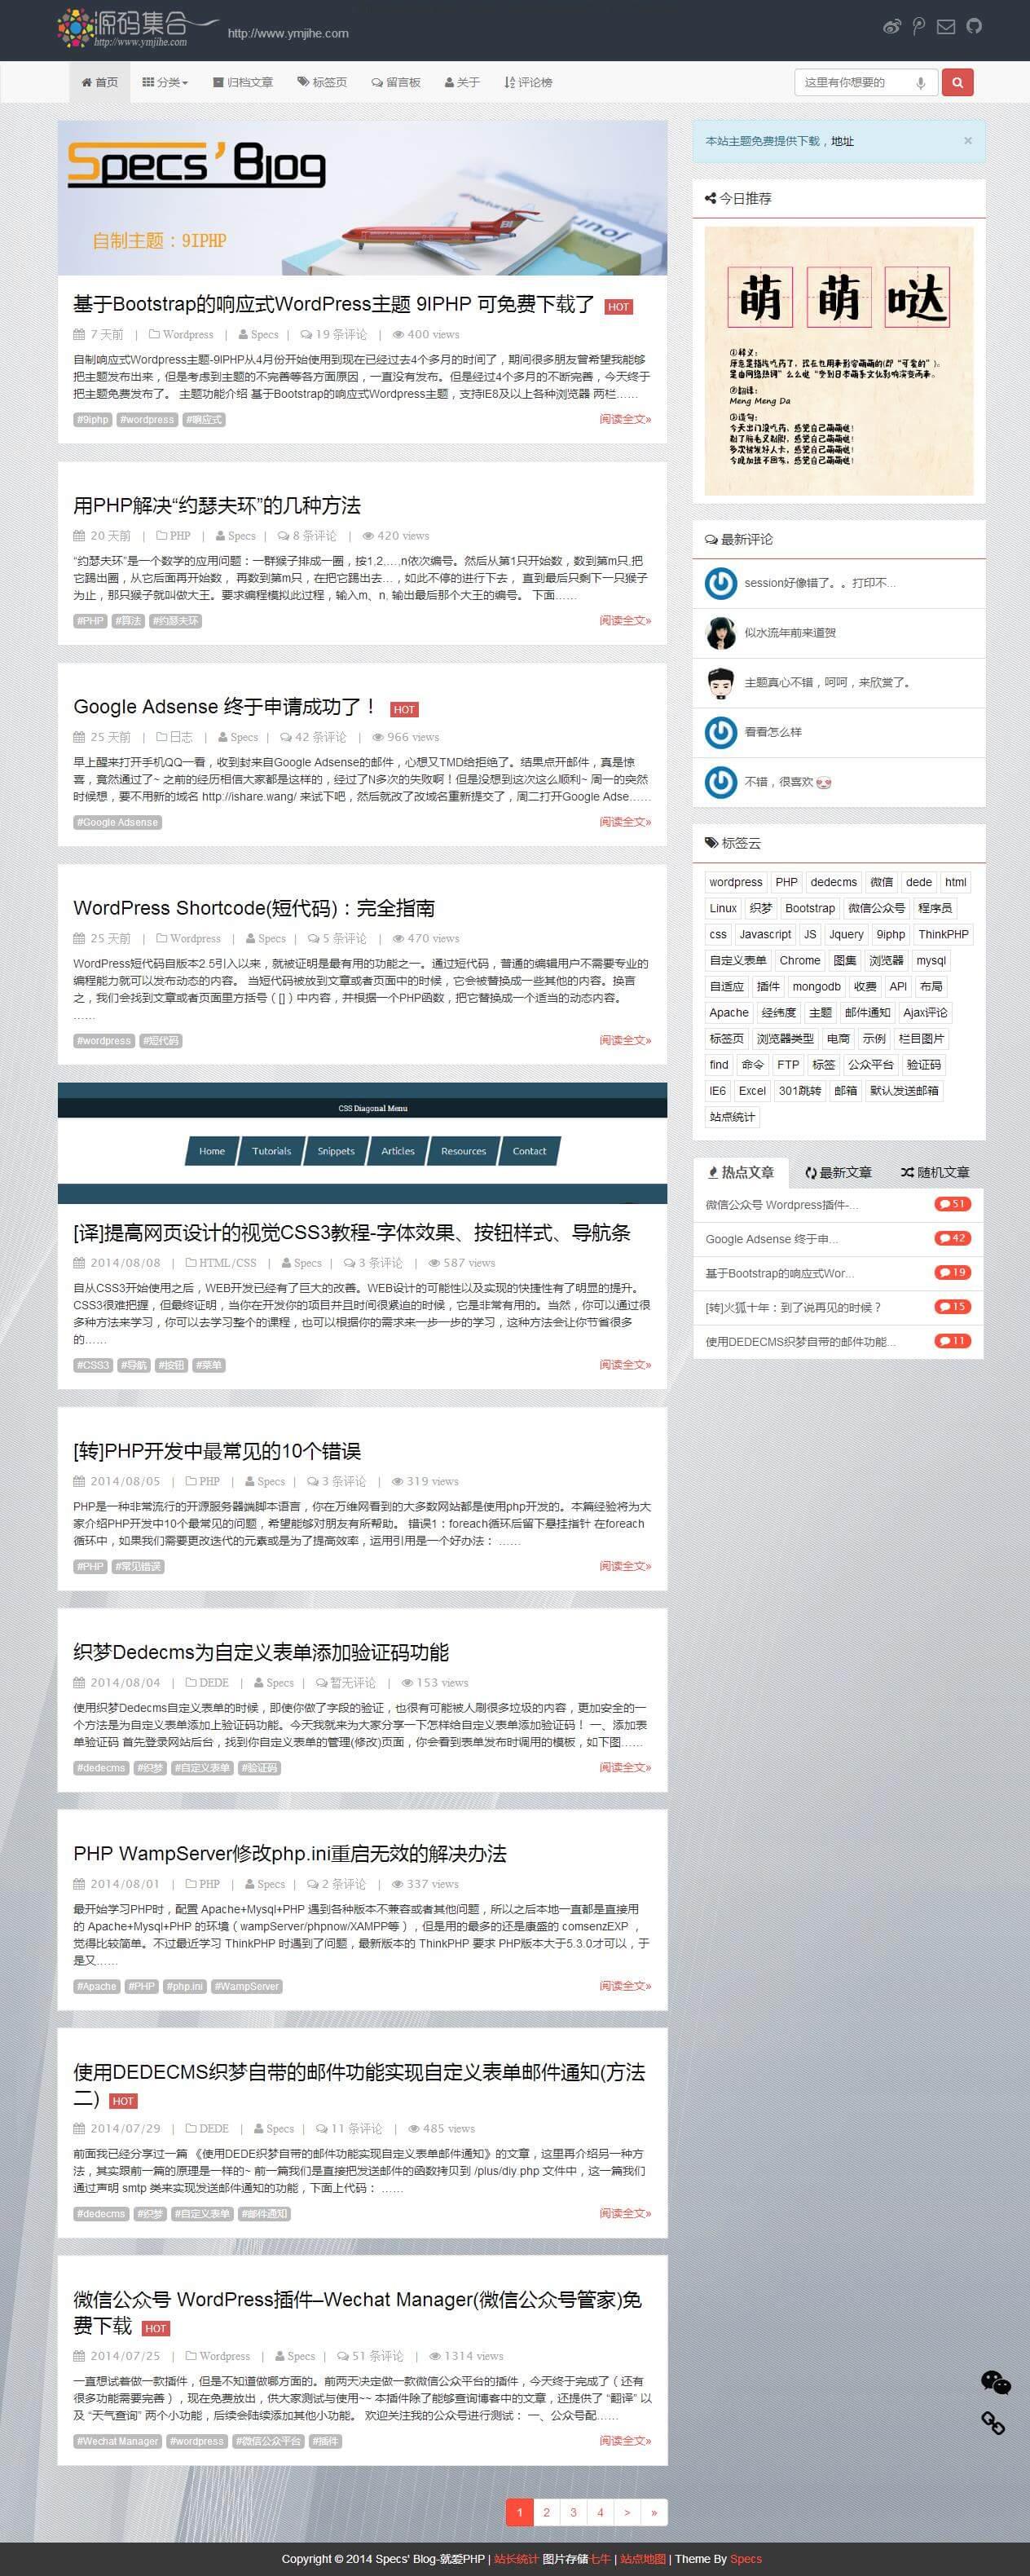 WordPress博客主题:基于Bootstrap的响应式9IPHP主题分享